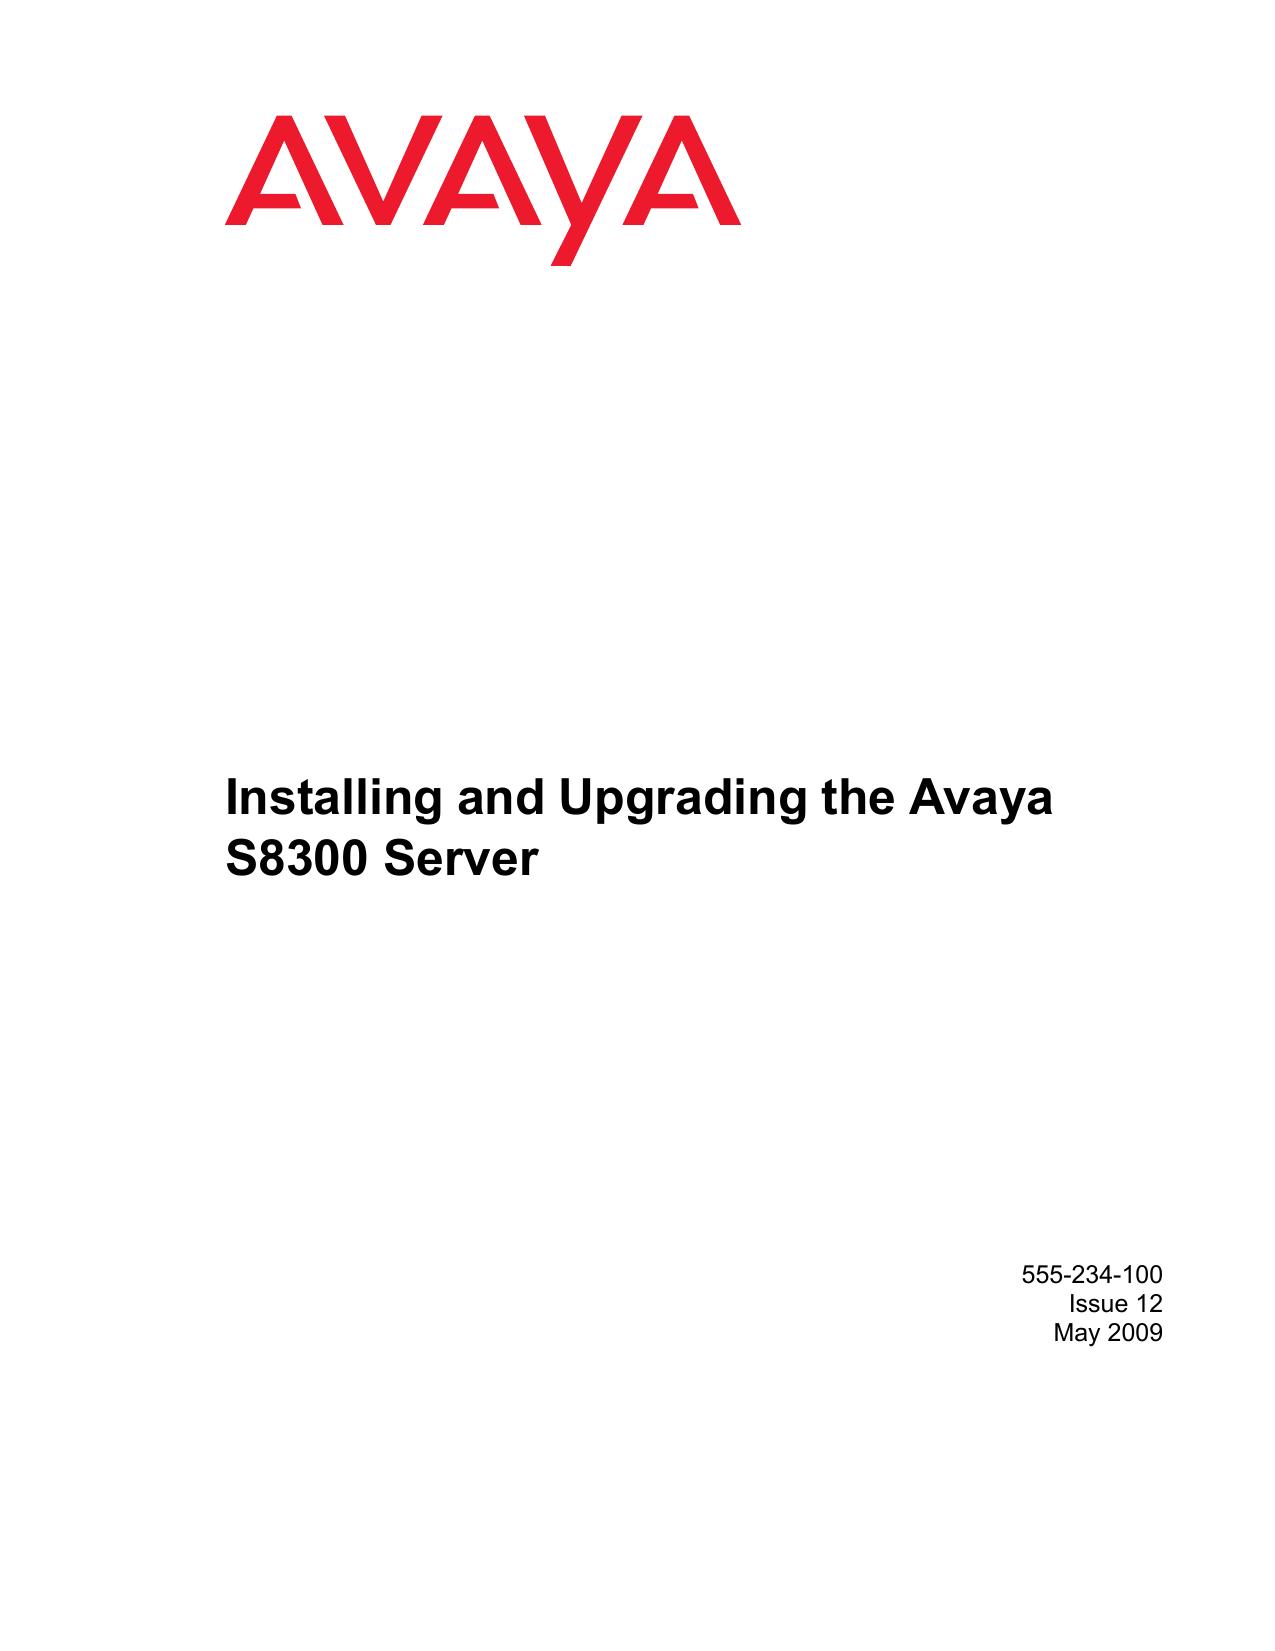 Installing and Upgrading the Avaya S8300 Server | manualzz com